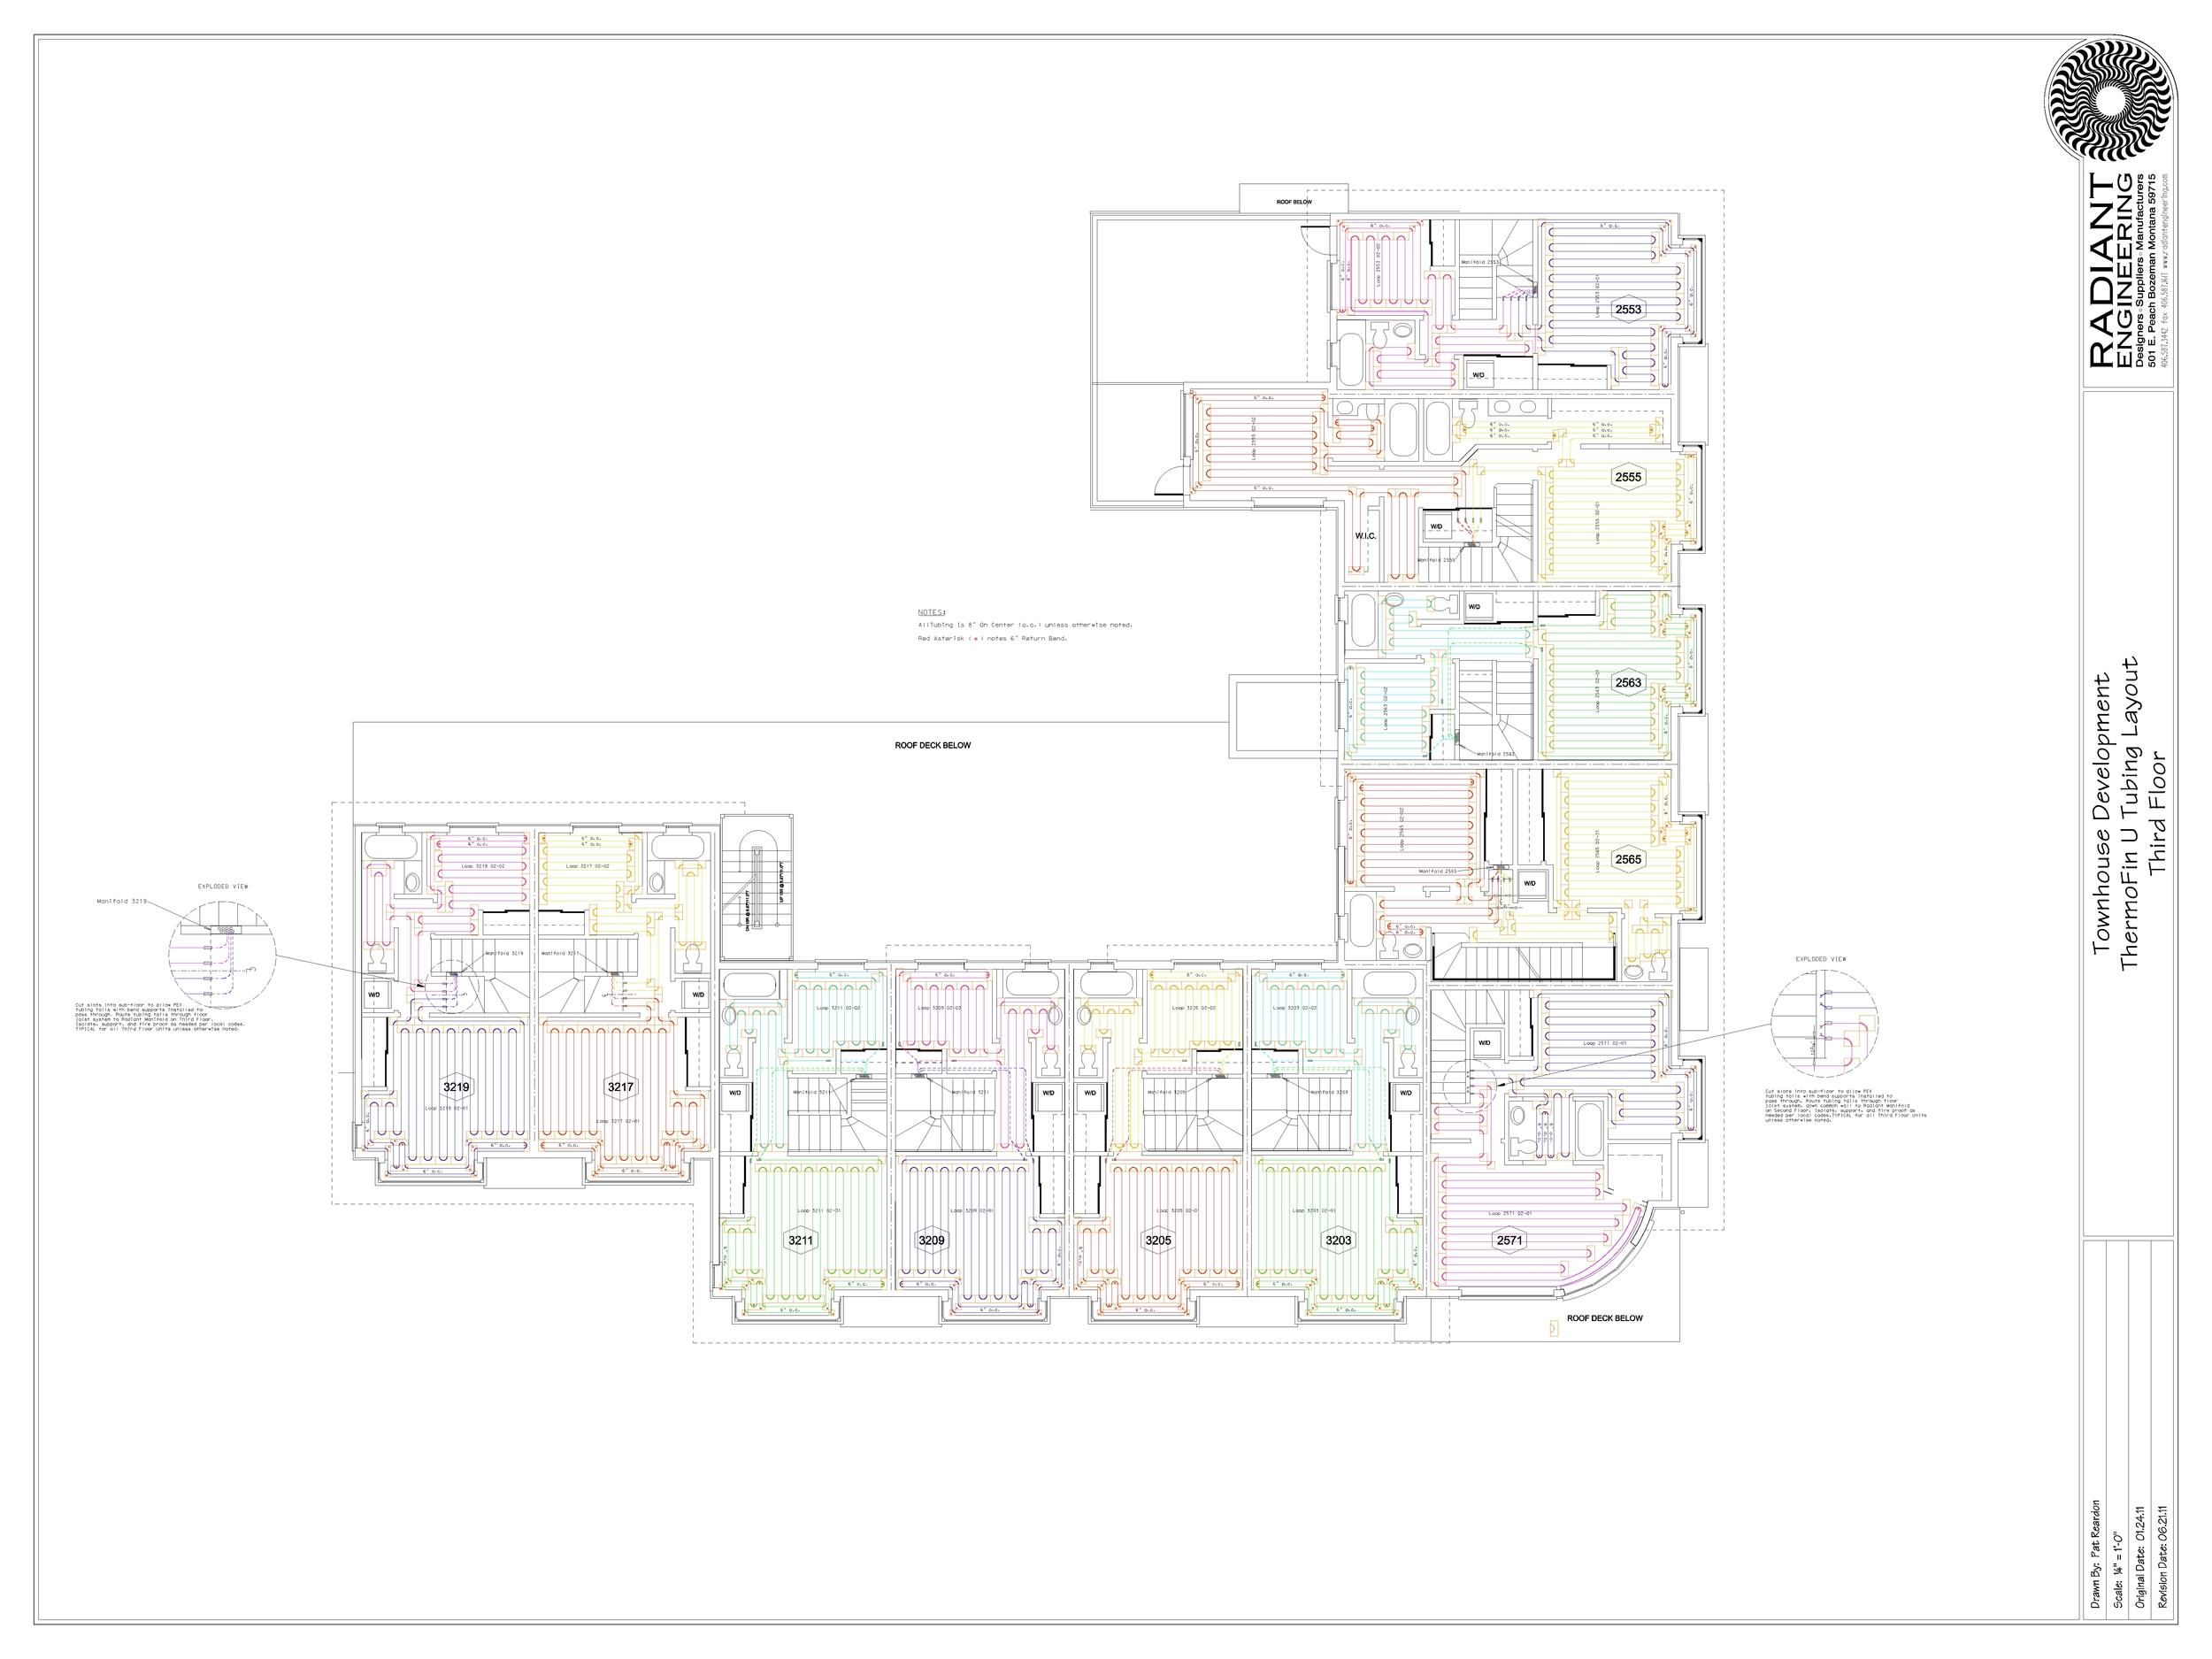 Townhouse Development Level 3